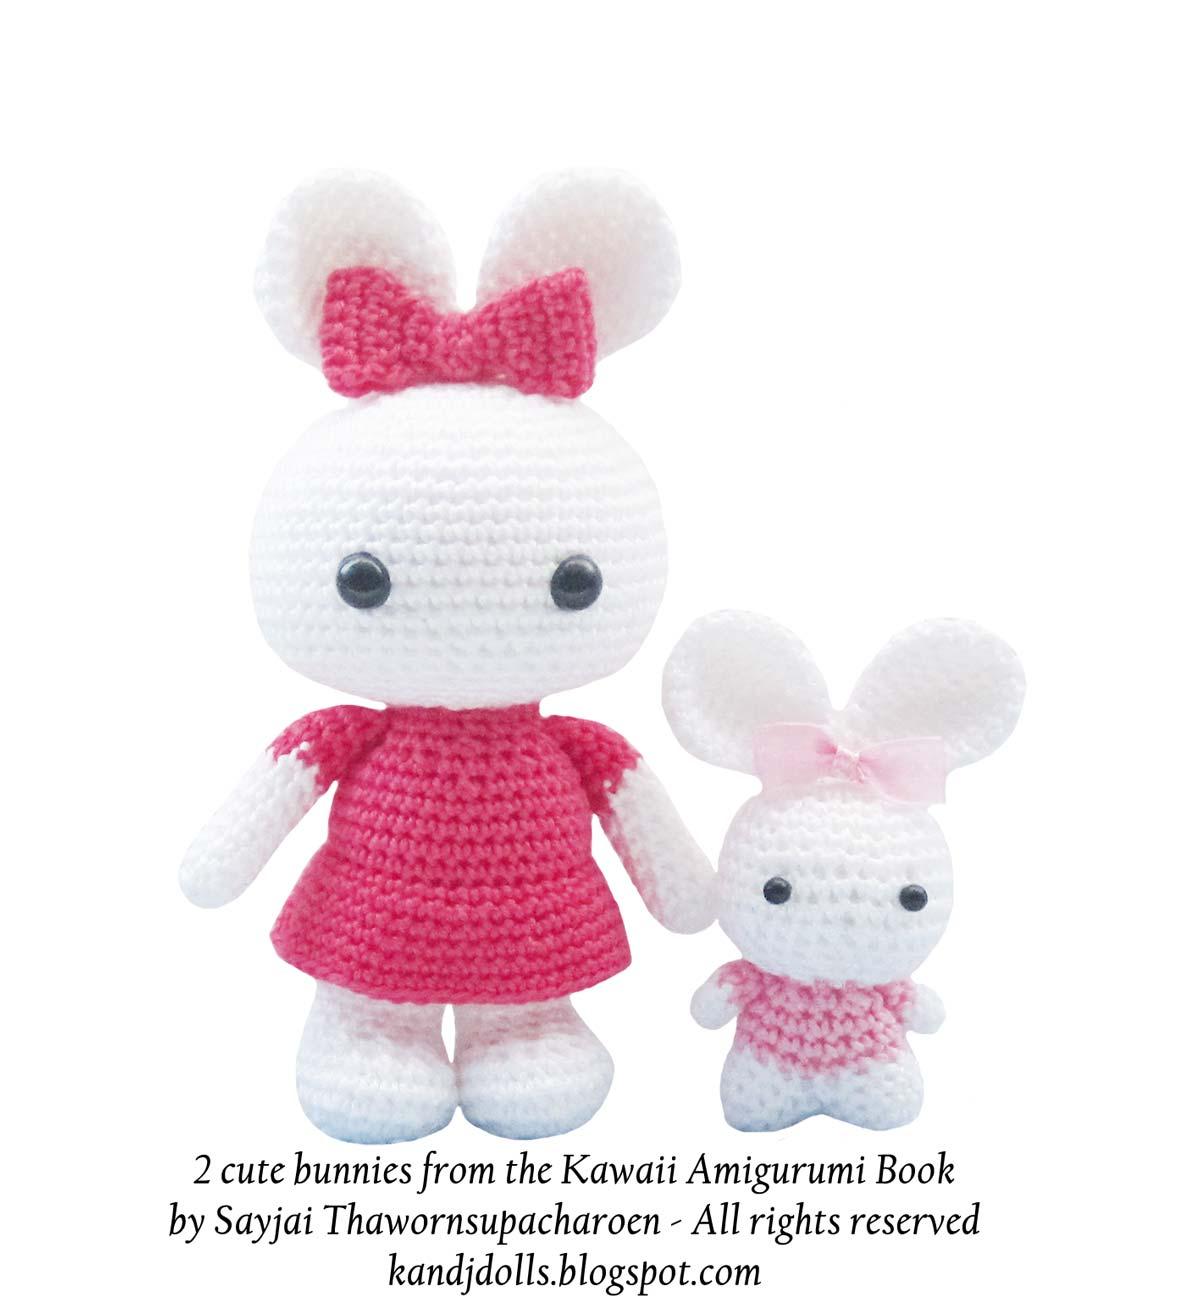 Kawaii Amigurumi Free Patterns : Kawaii Amigurumi - a brand new Pattern Book - Sayjai ...